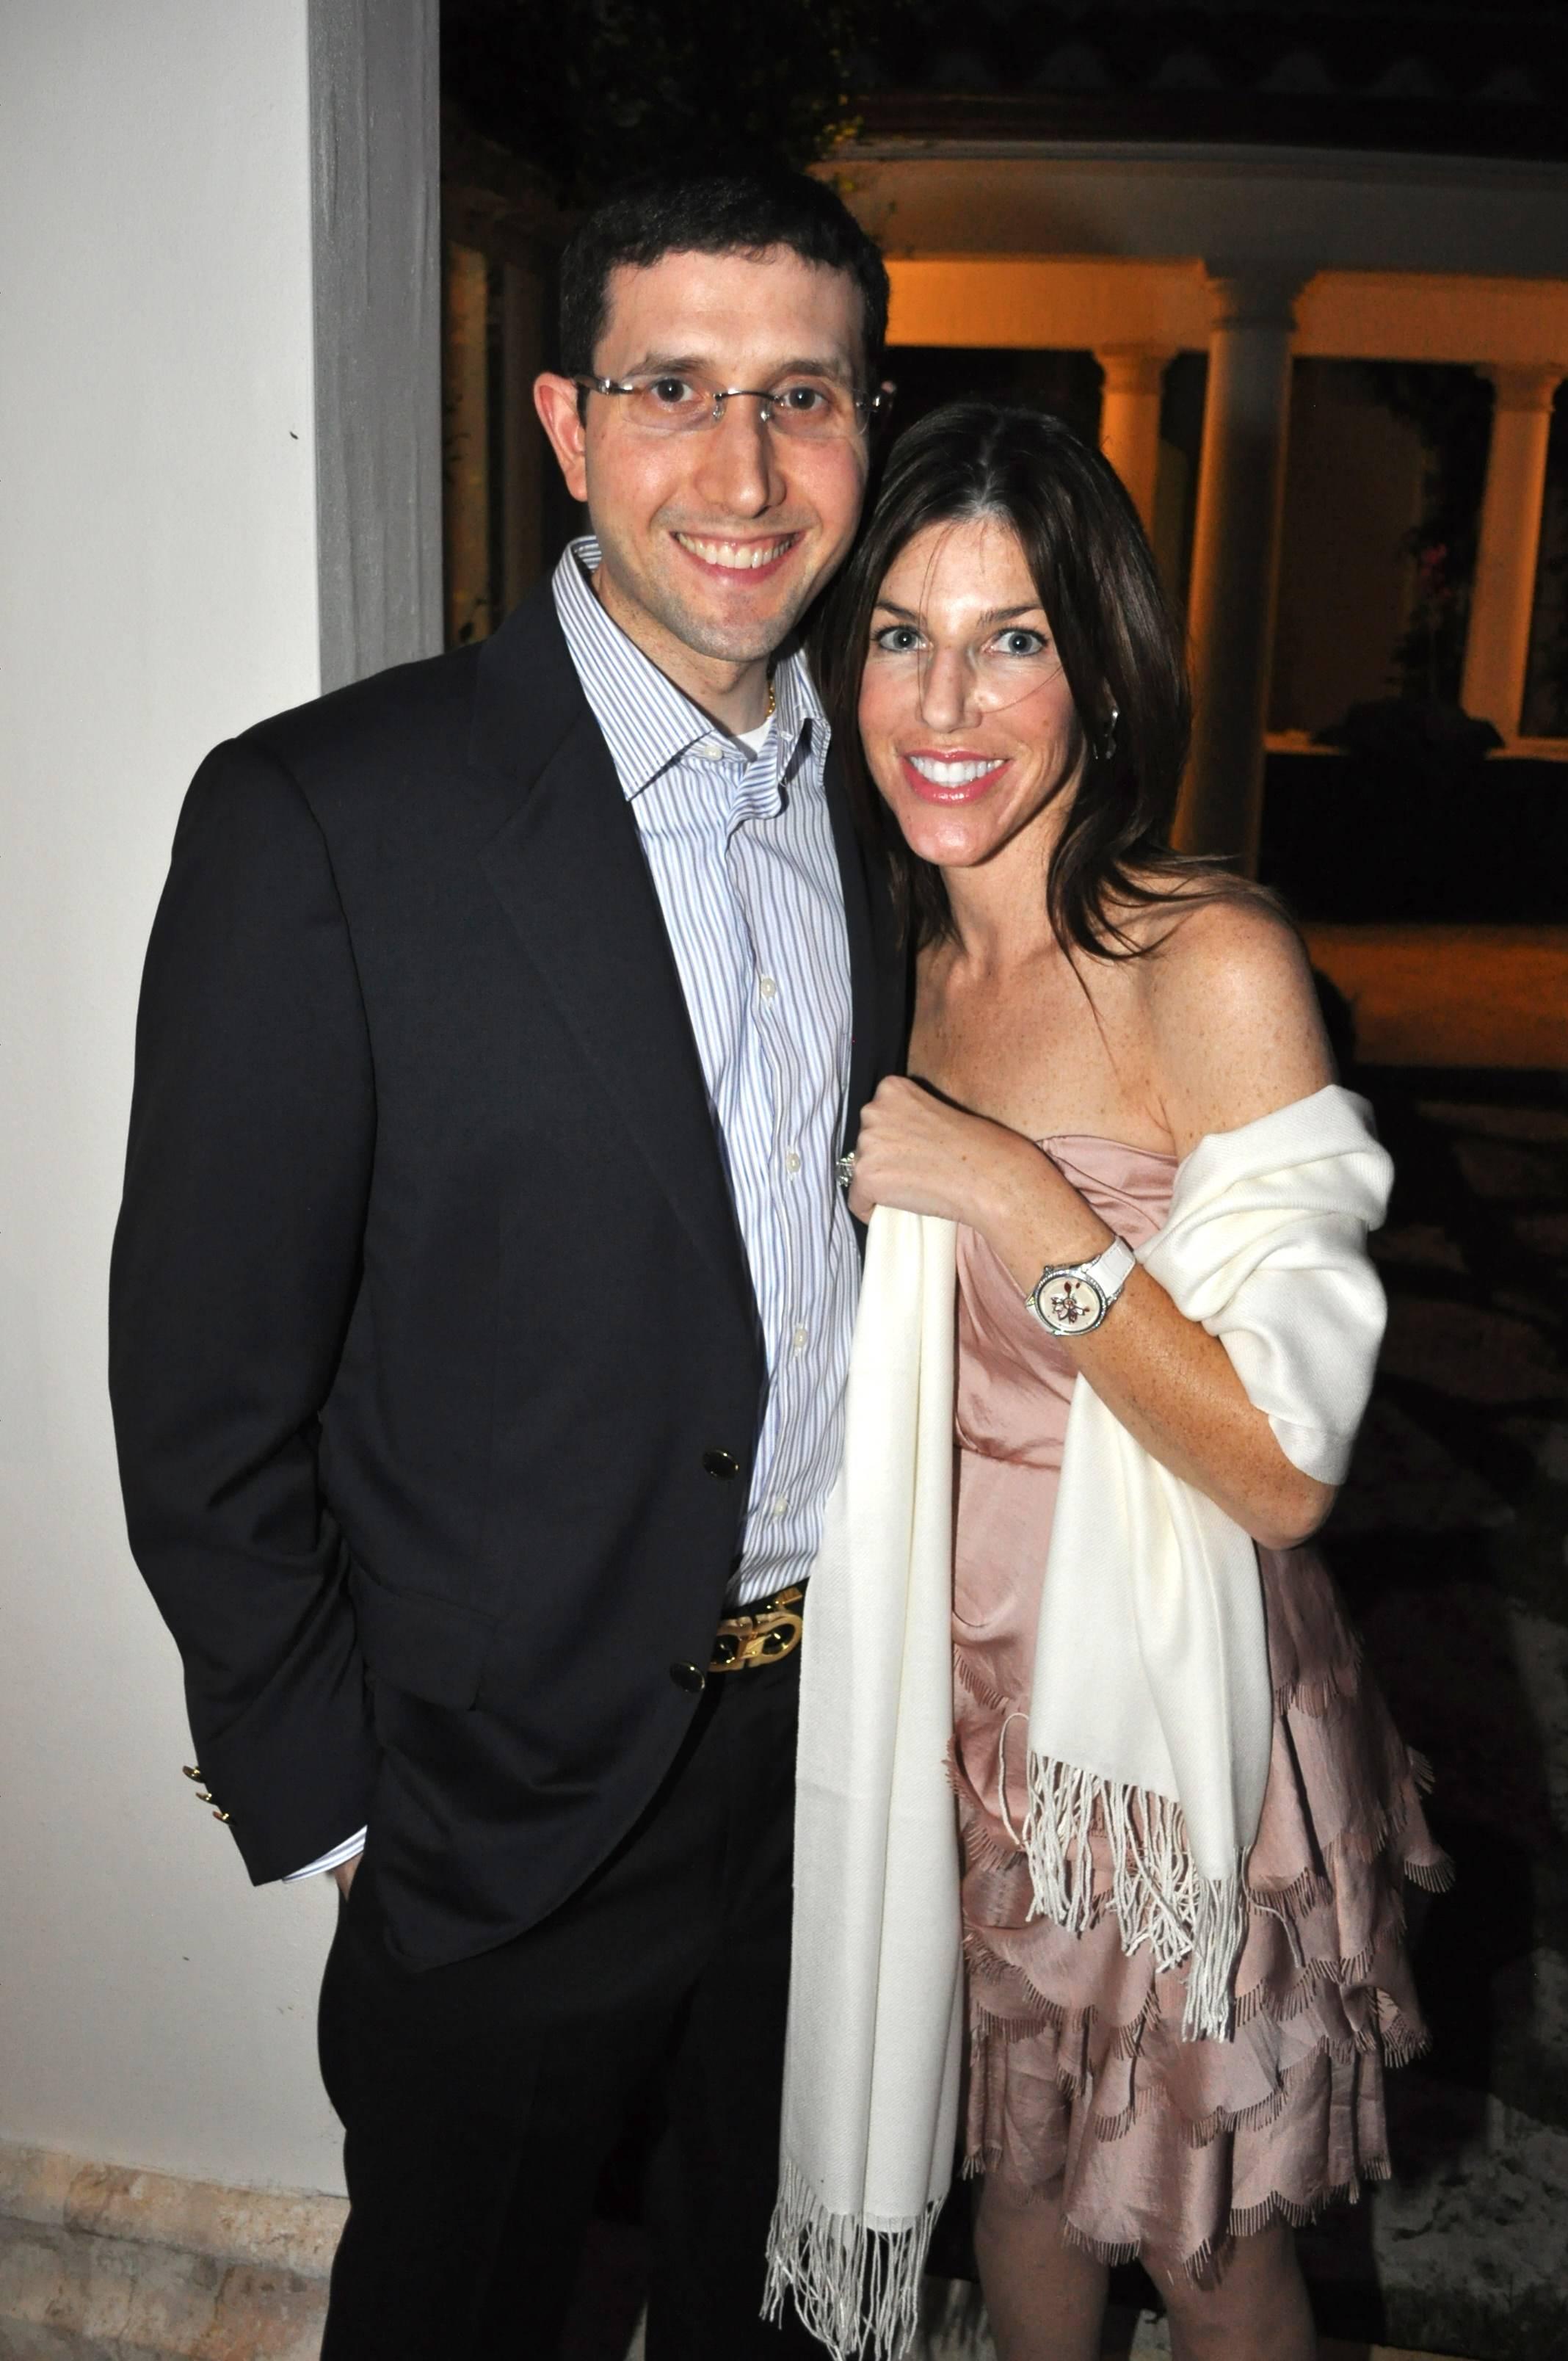 06 Josh and Michele Berlin at the Penn Medicine event